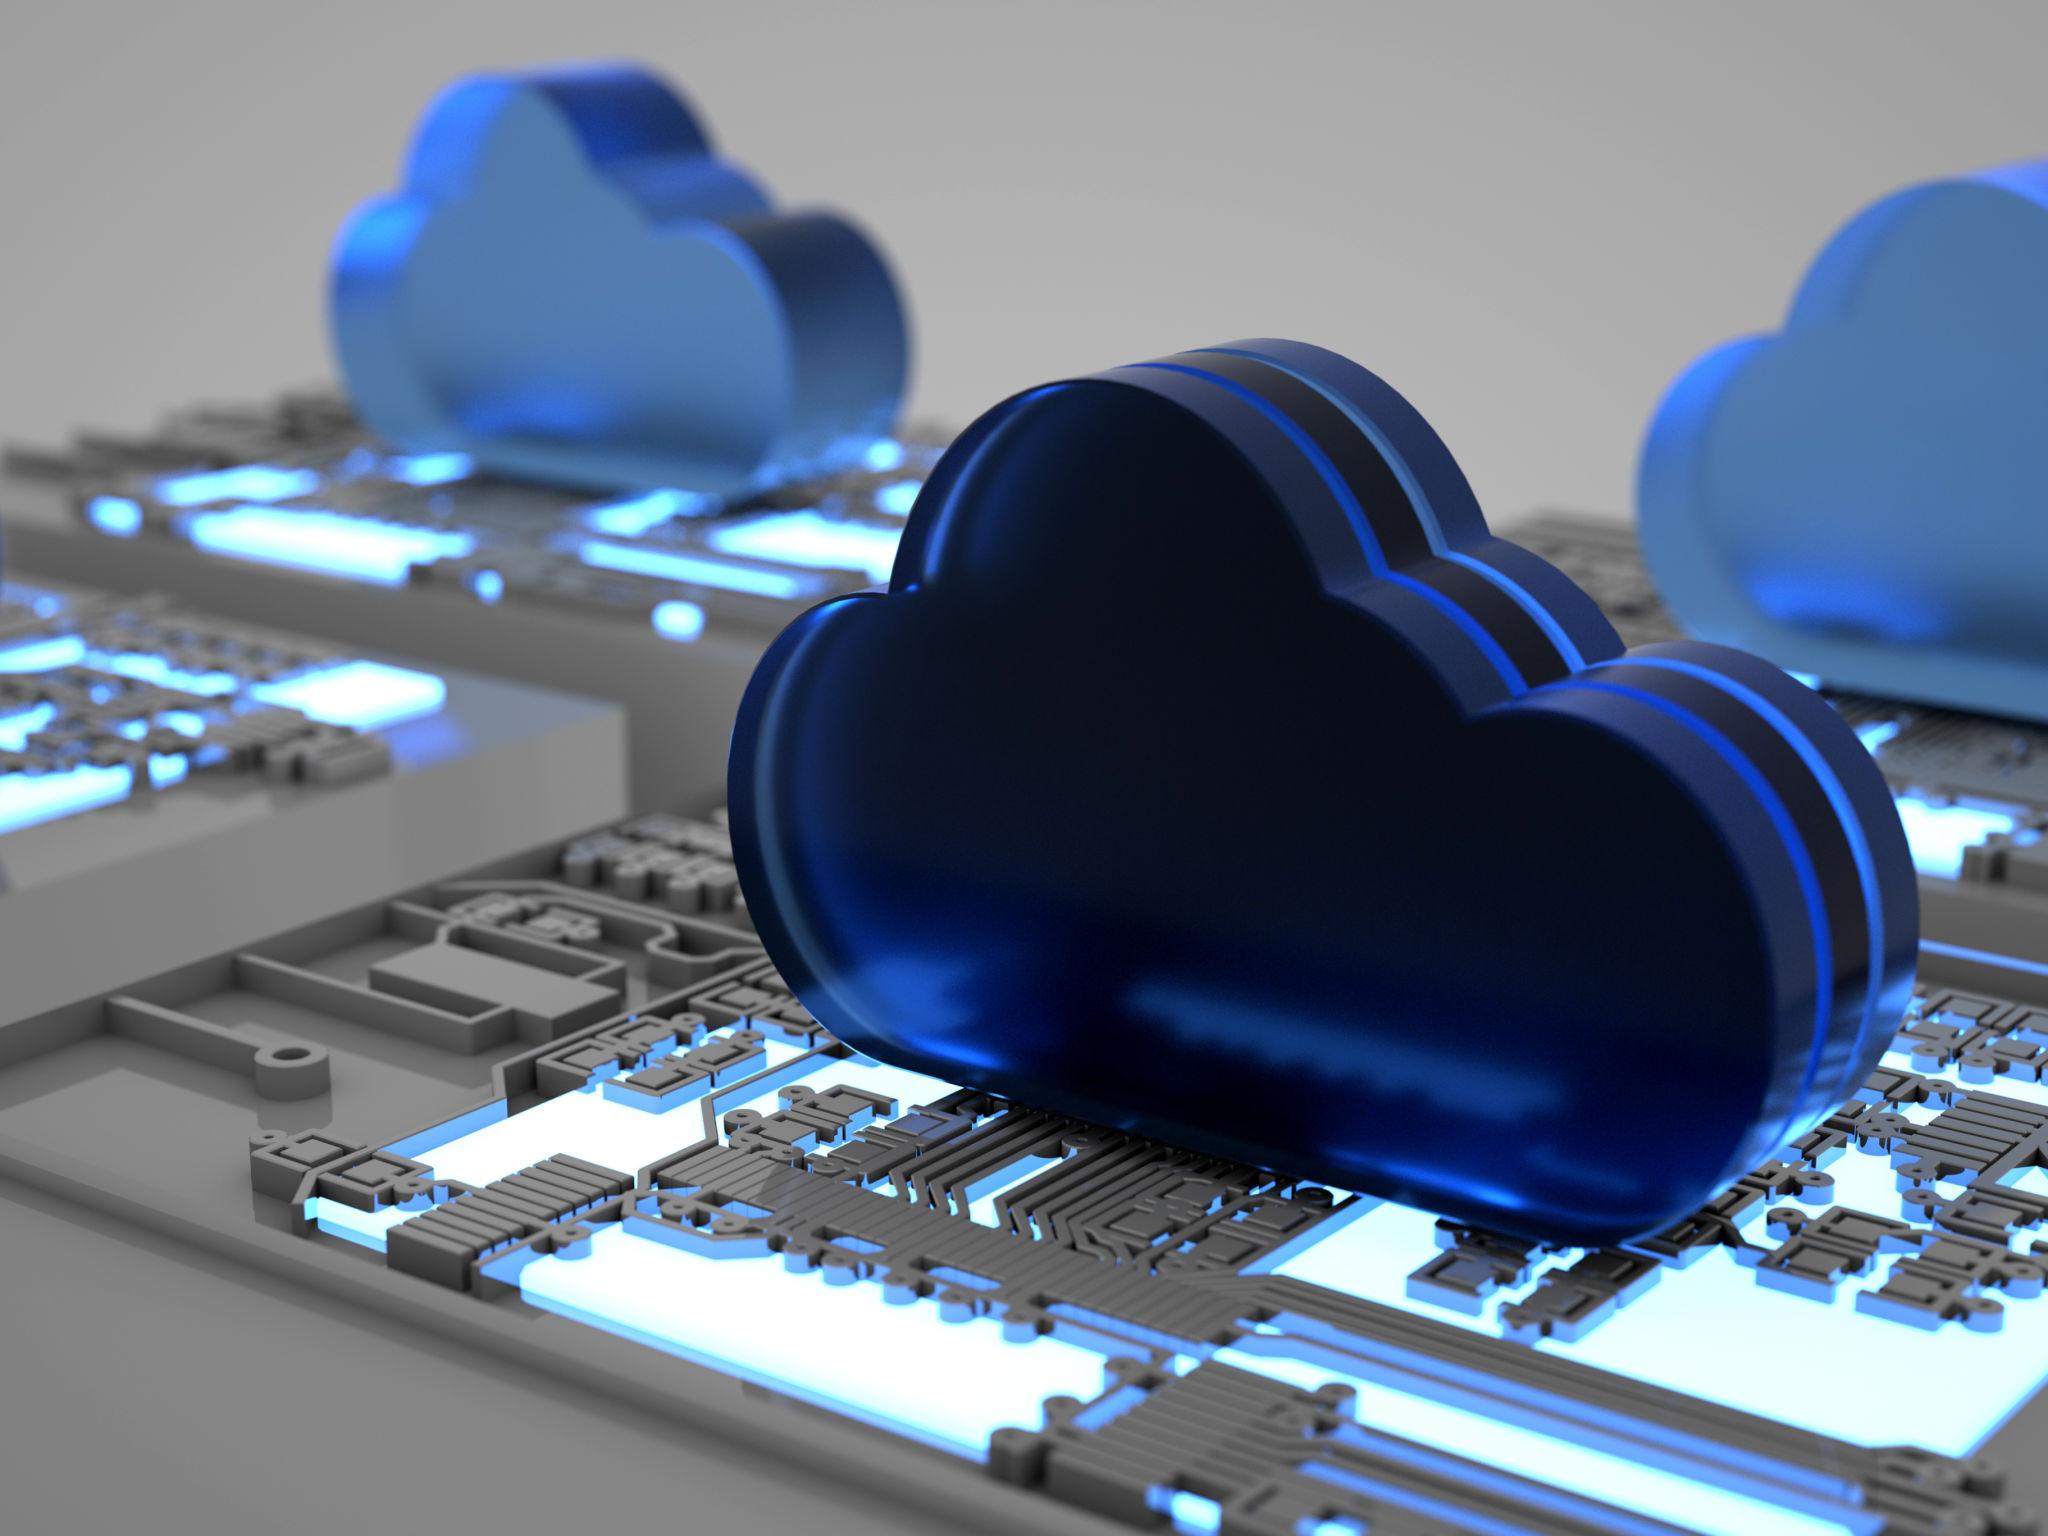 Cloud computing stocks, cloud data center stocks, cloud stocks